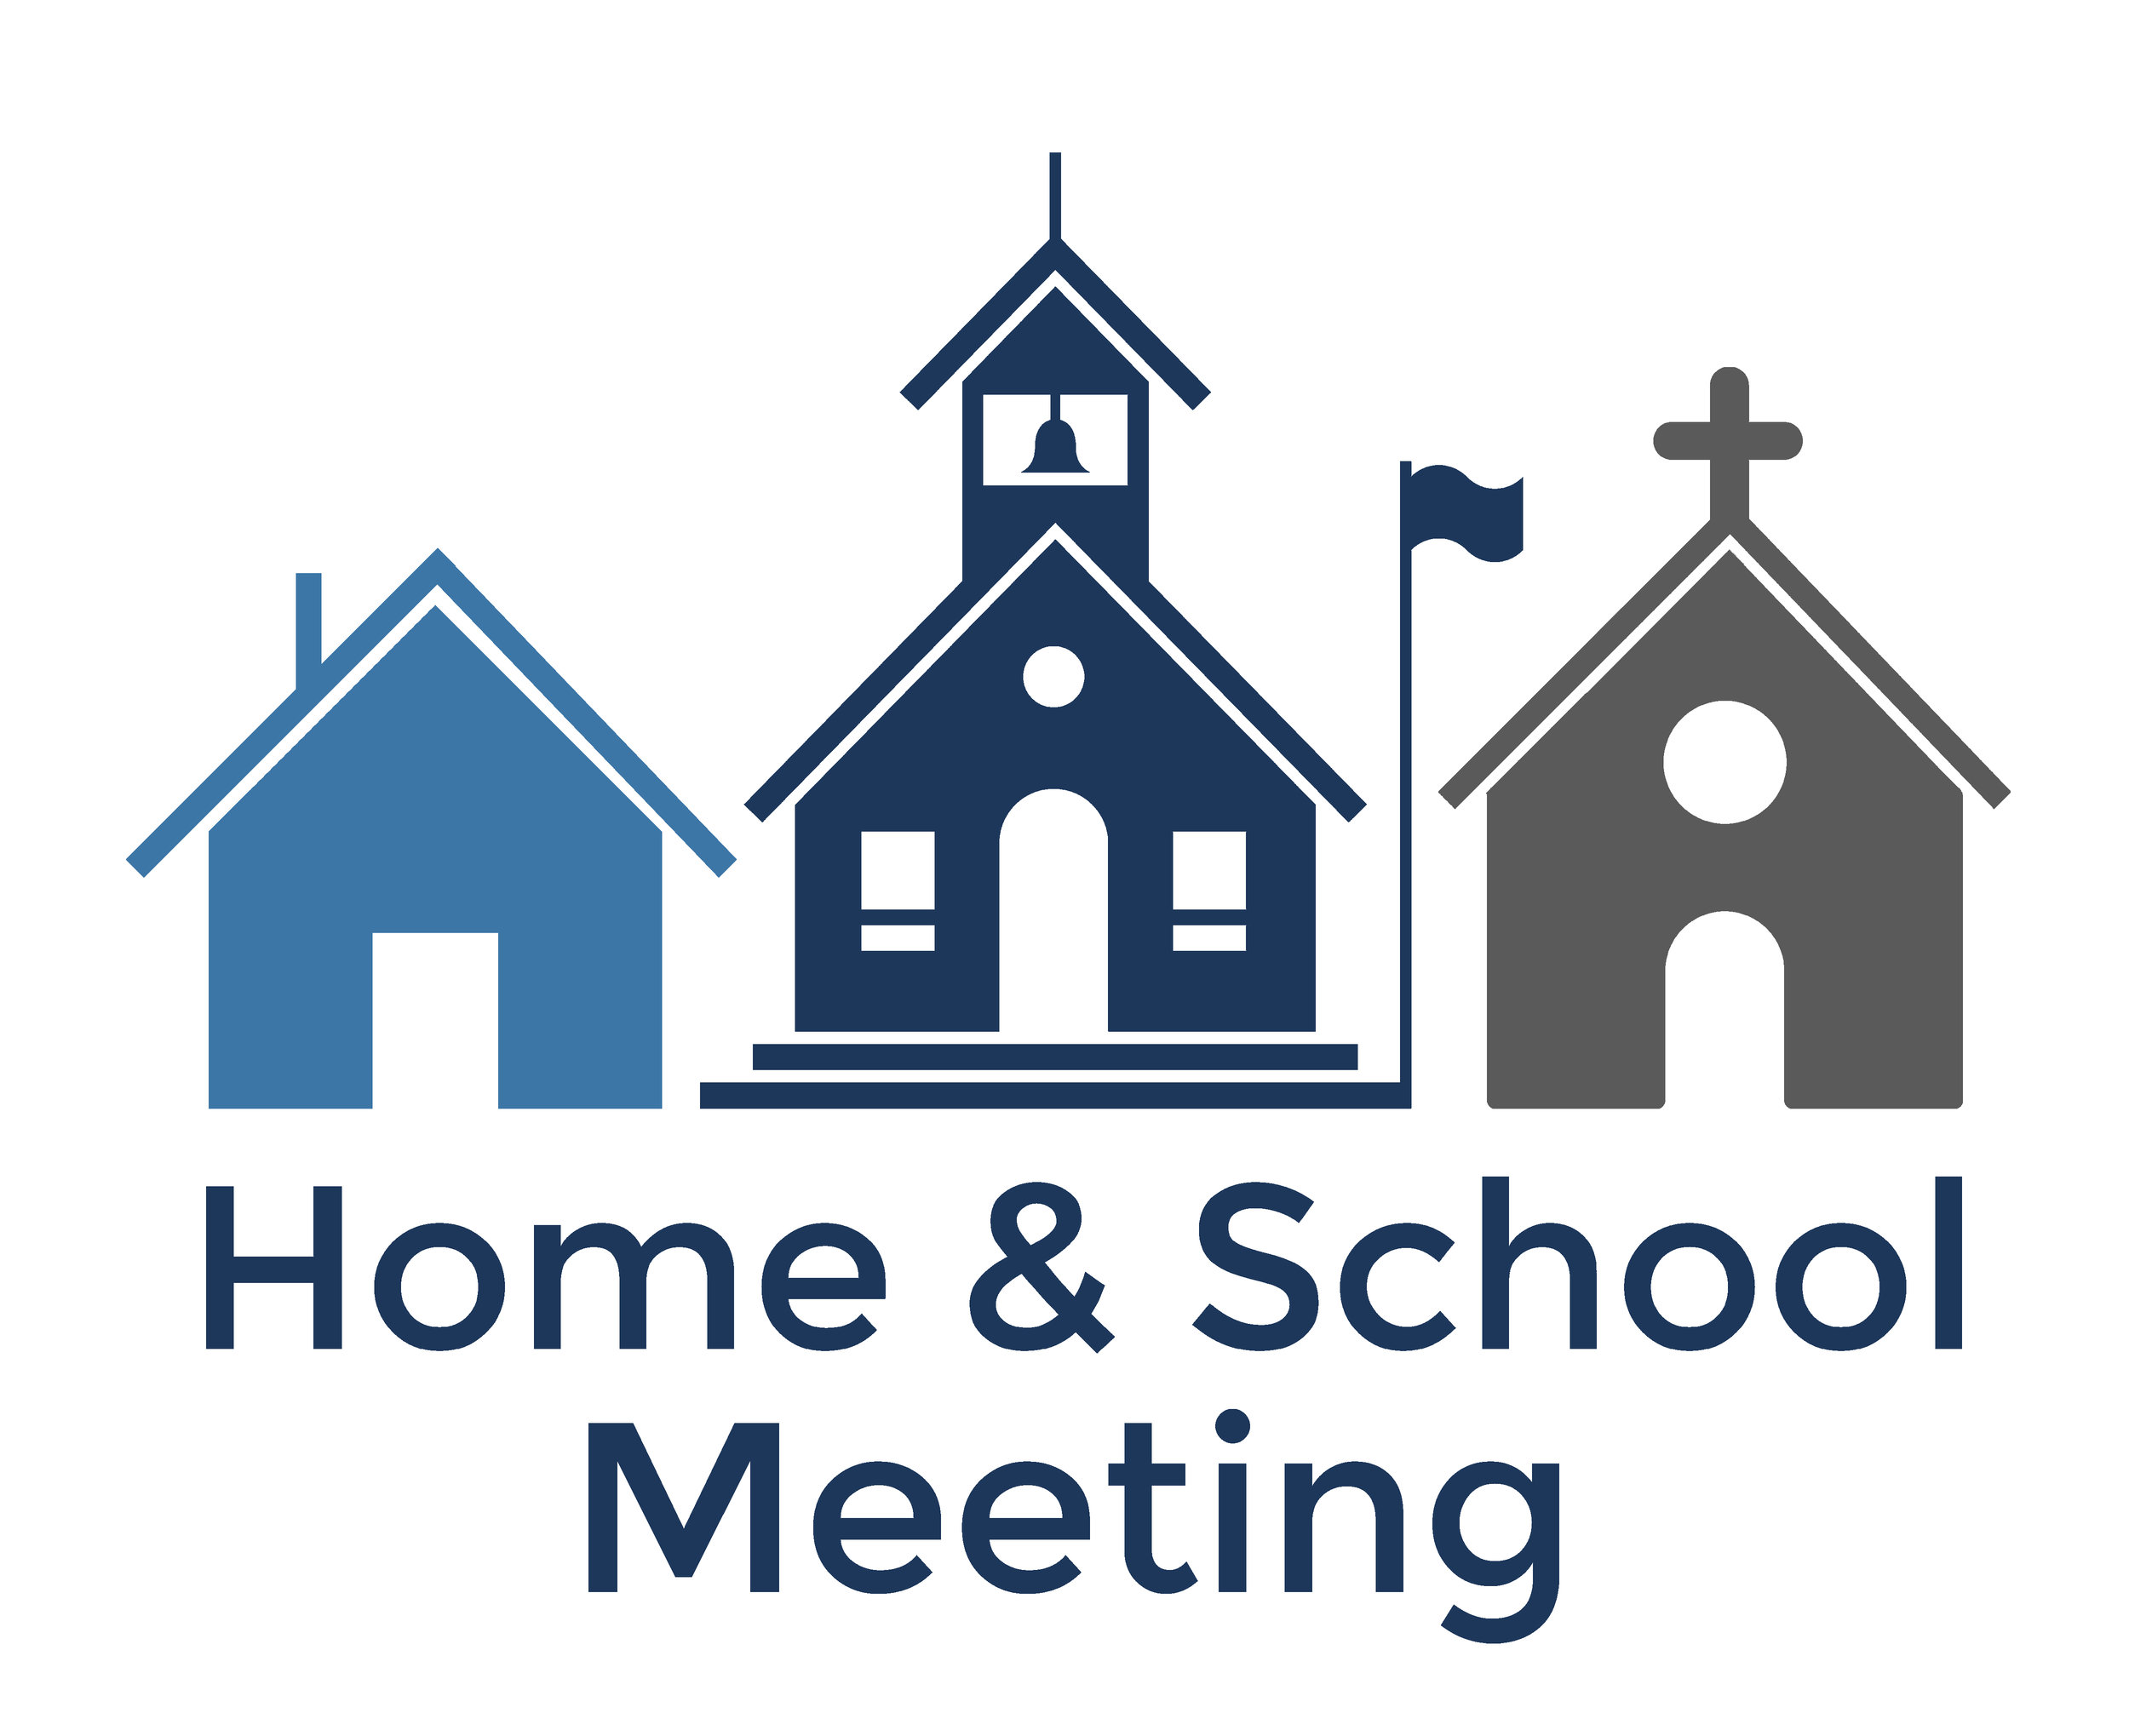 Home & School Meeting - Logo.jpg